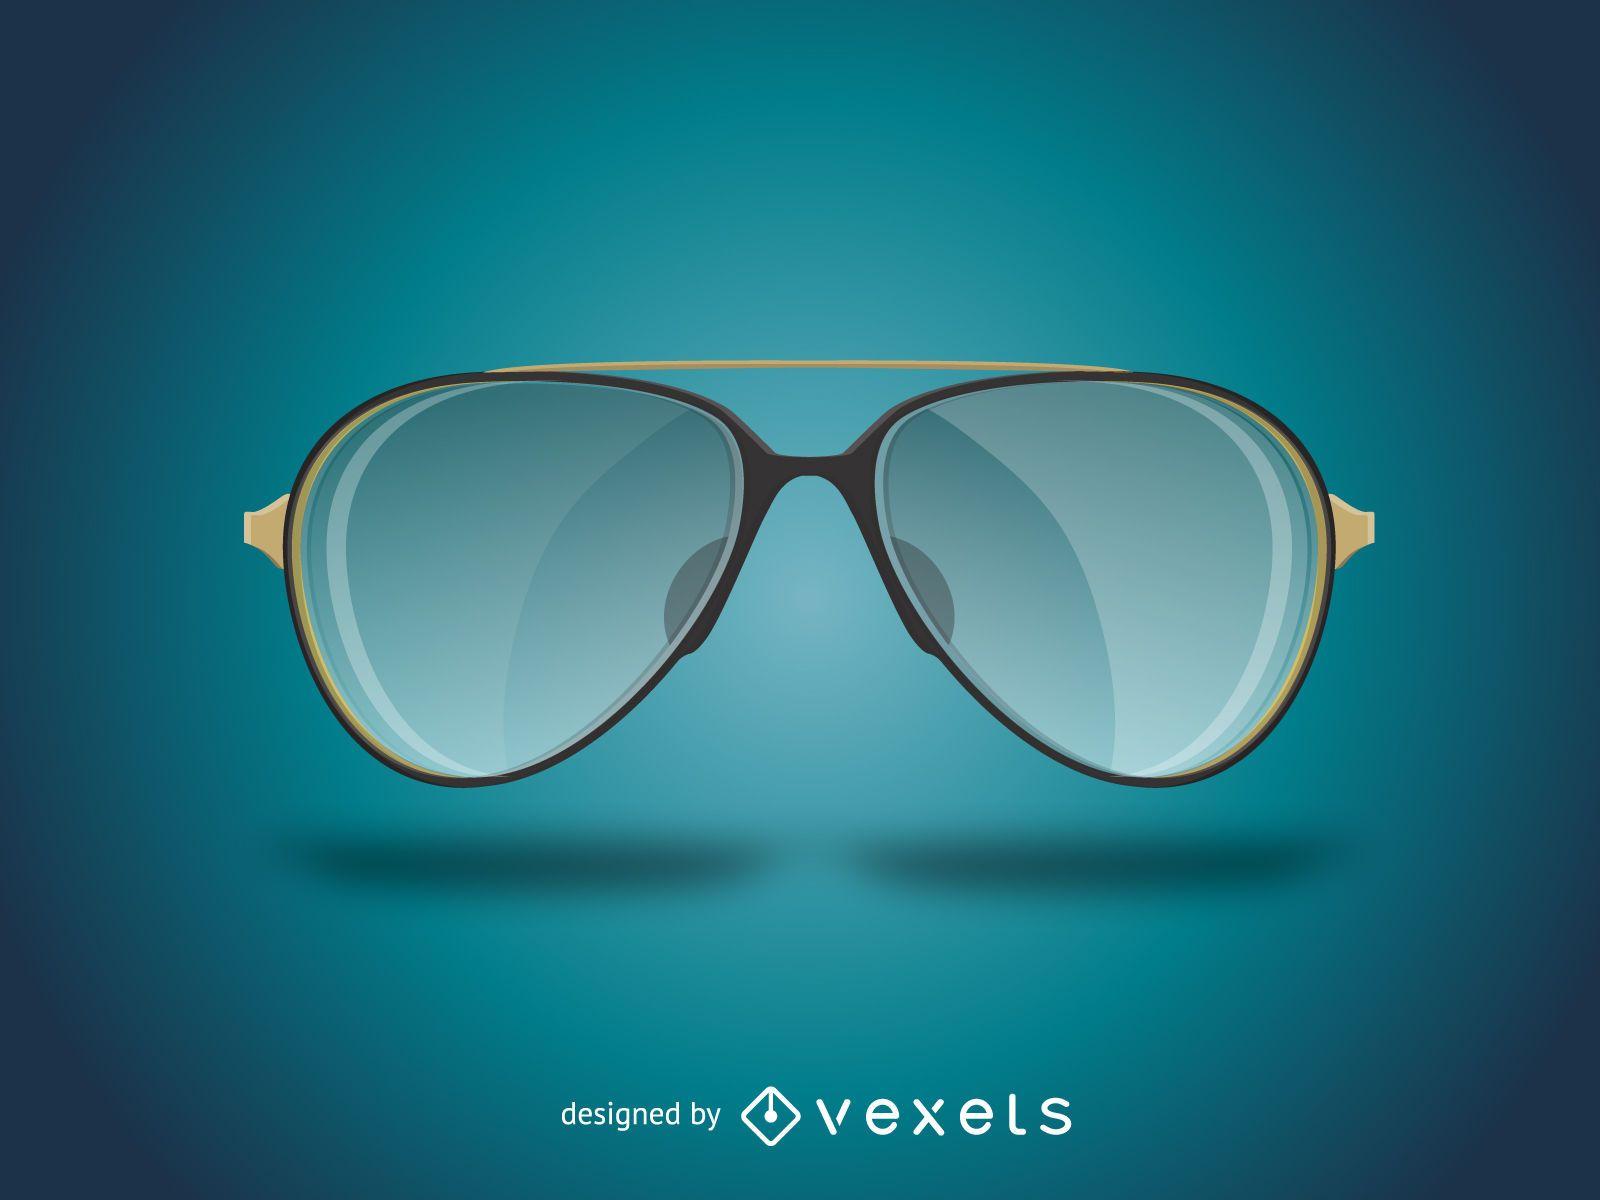 Realistic aviator sunglasses illustration